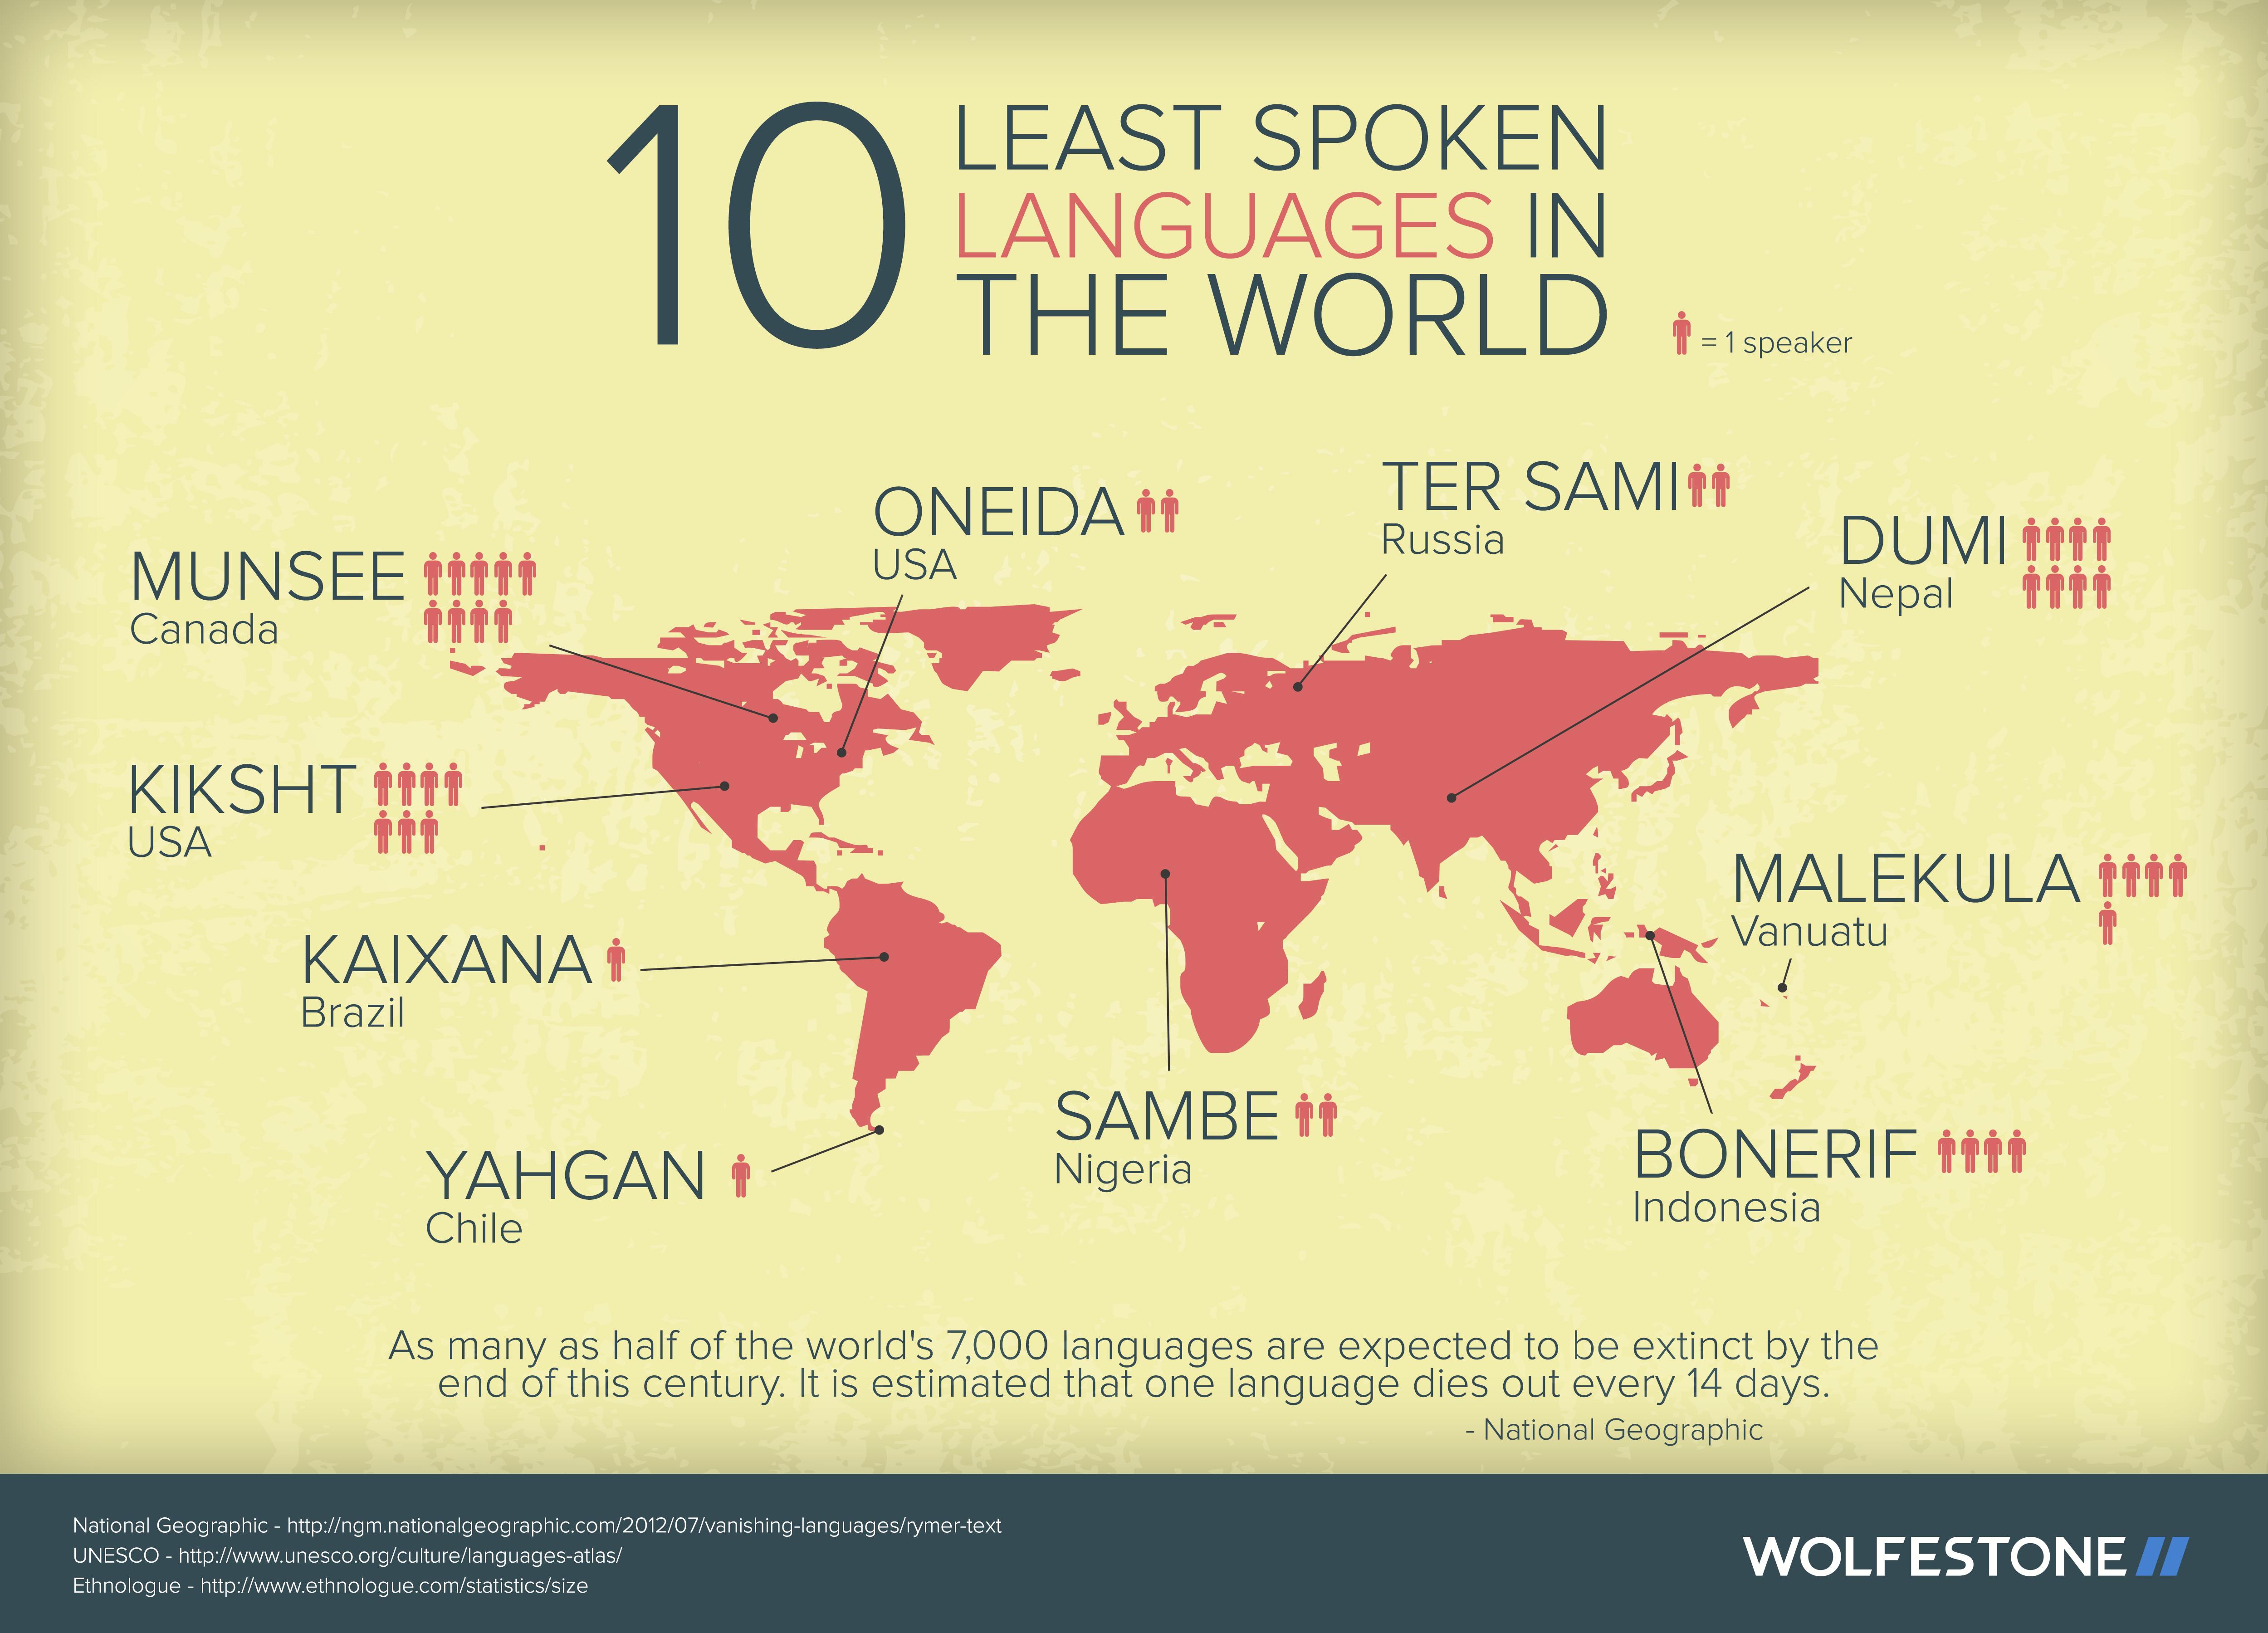 least-spoken-languages-world-infographic